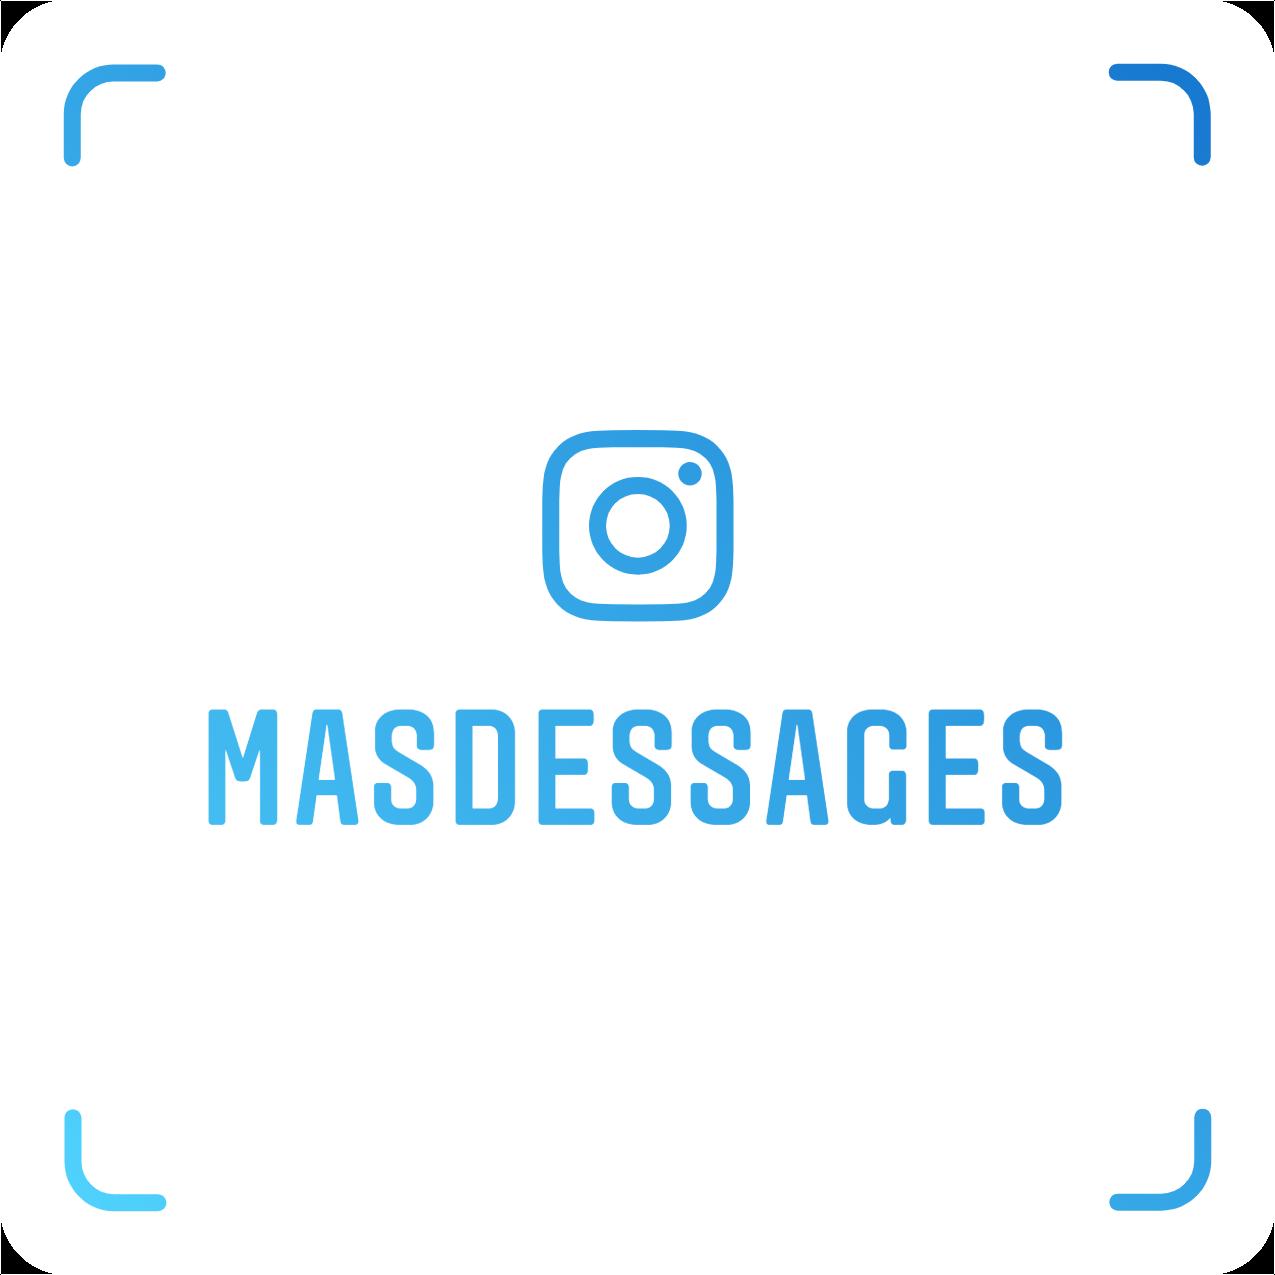 masdessages_nametag (1).png